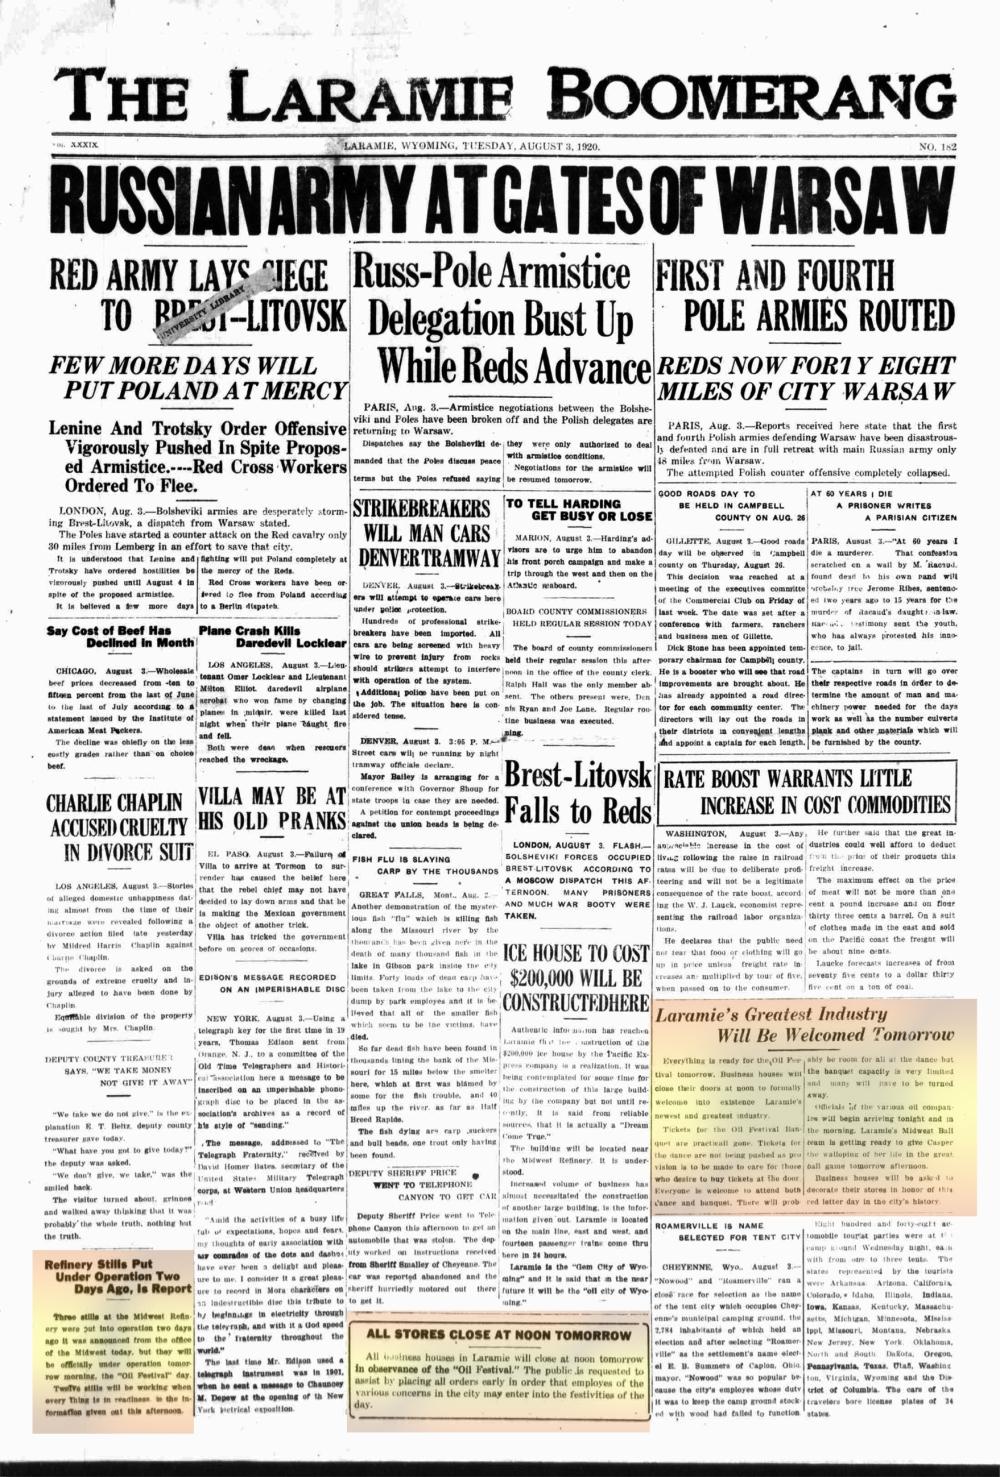 Laramie Boomerang 3rdAugust1920, page 1